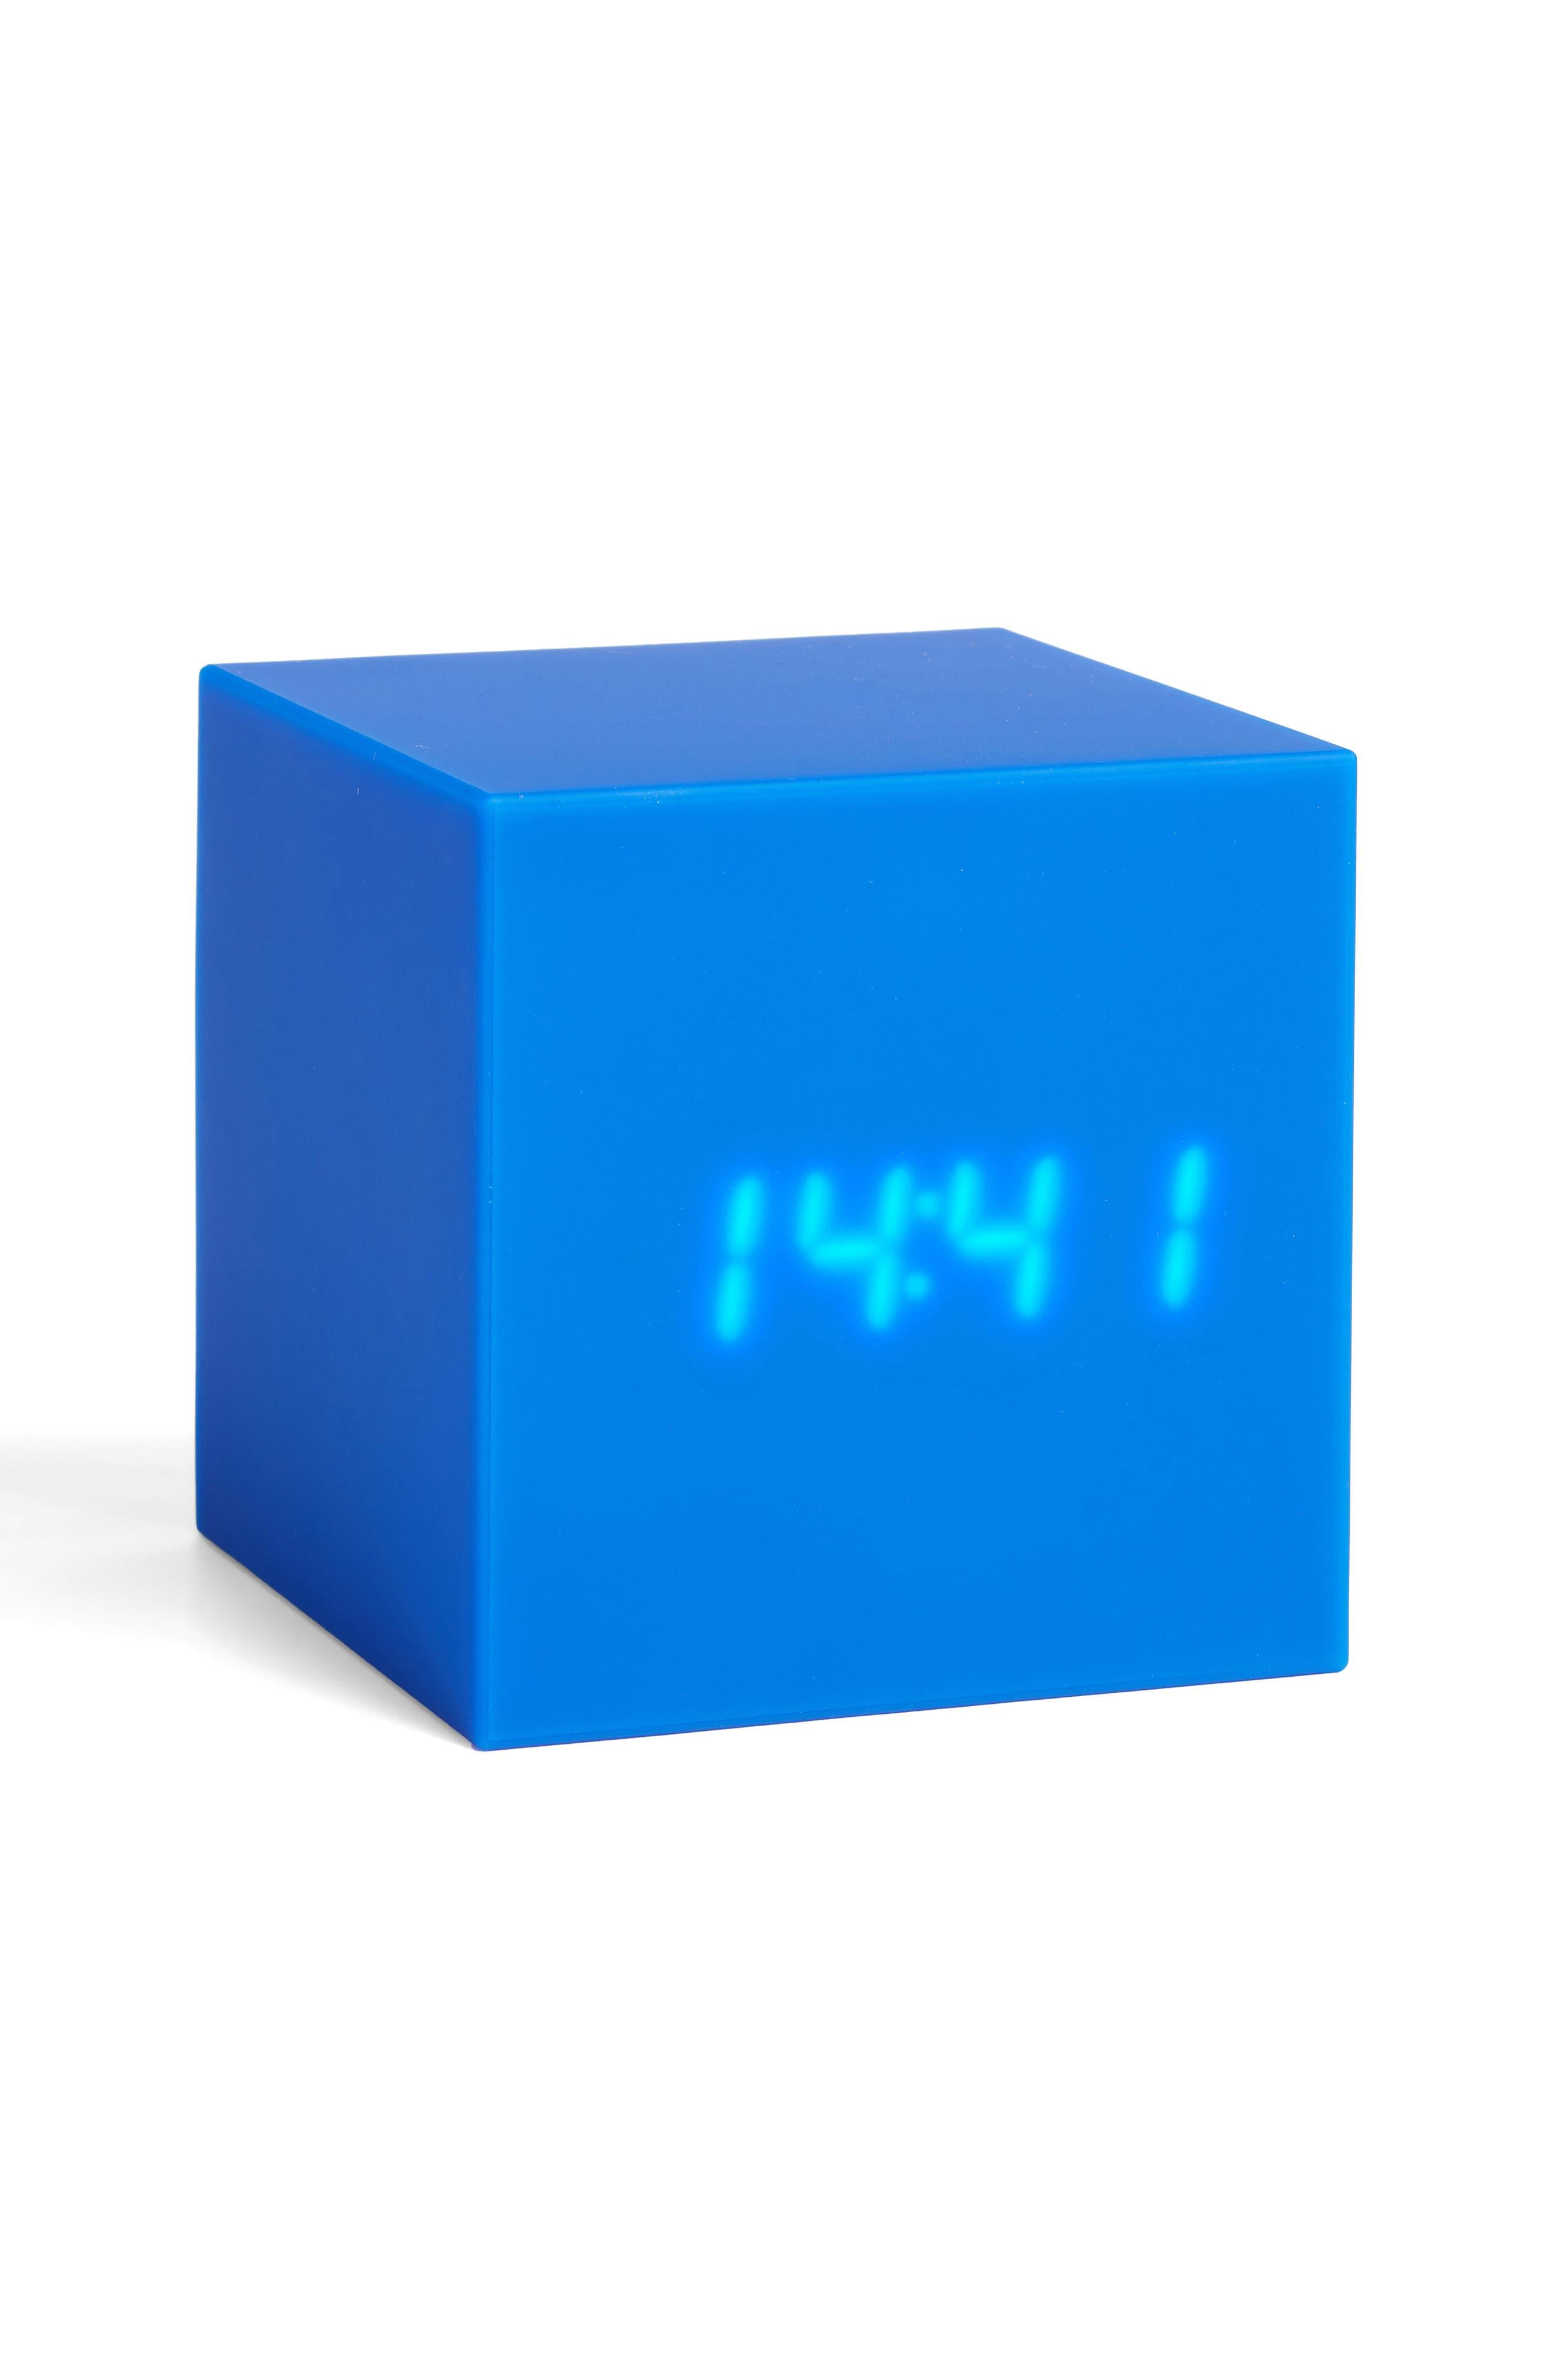 Color Cube Clock,                             Main thumbnail 1, color,                             001